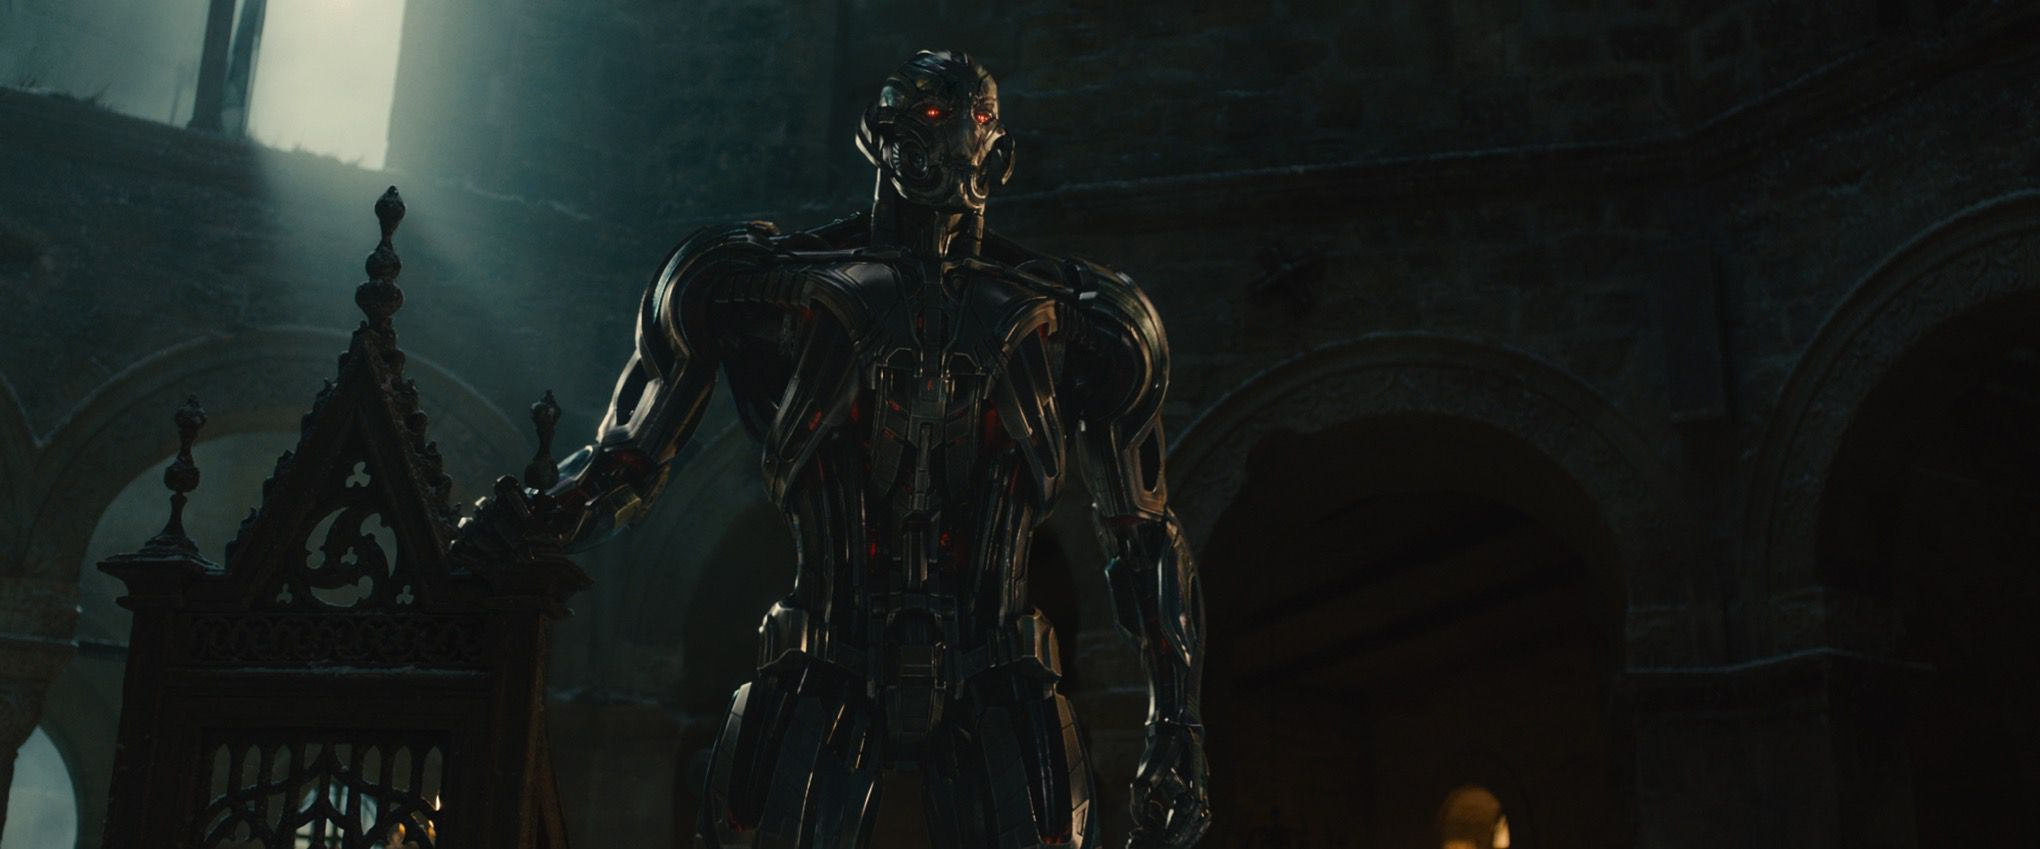 Avengers: Age of Ultron promotional still (DISNEY/MARVEL)